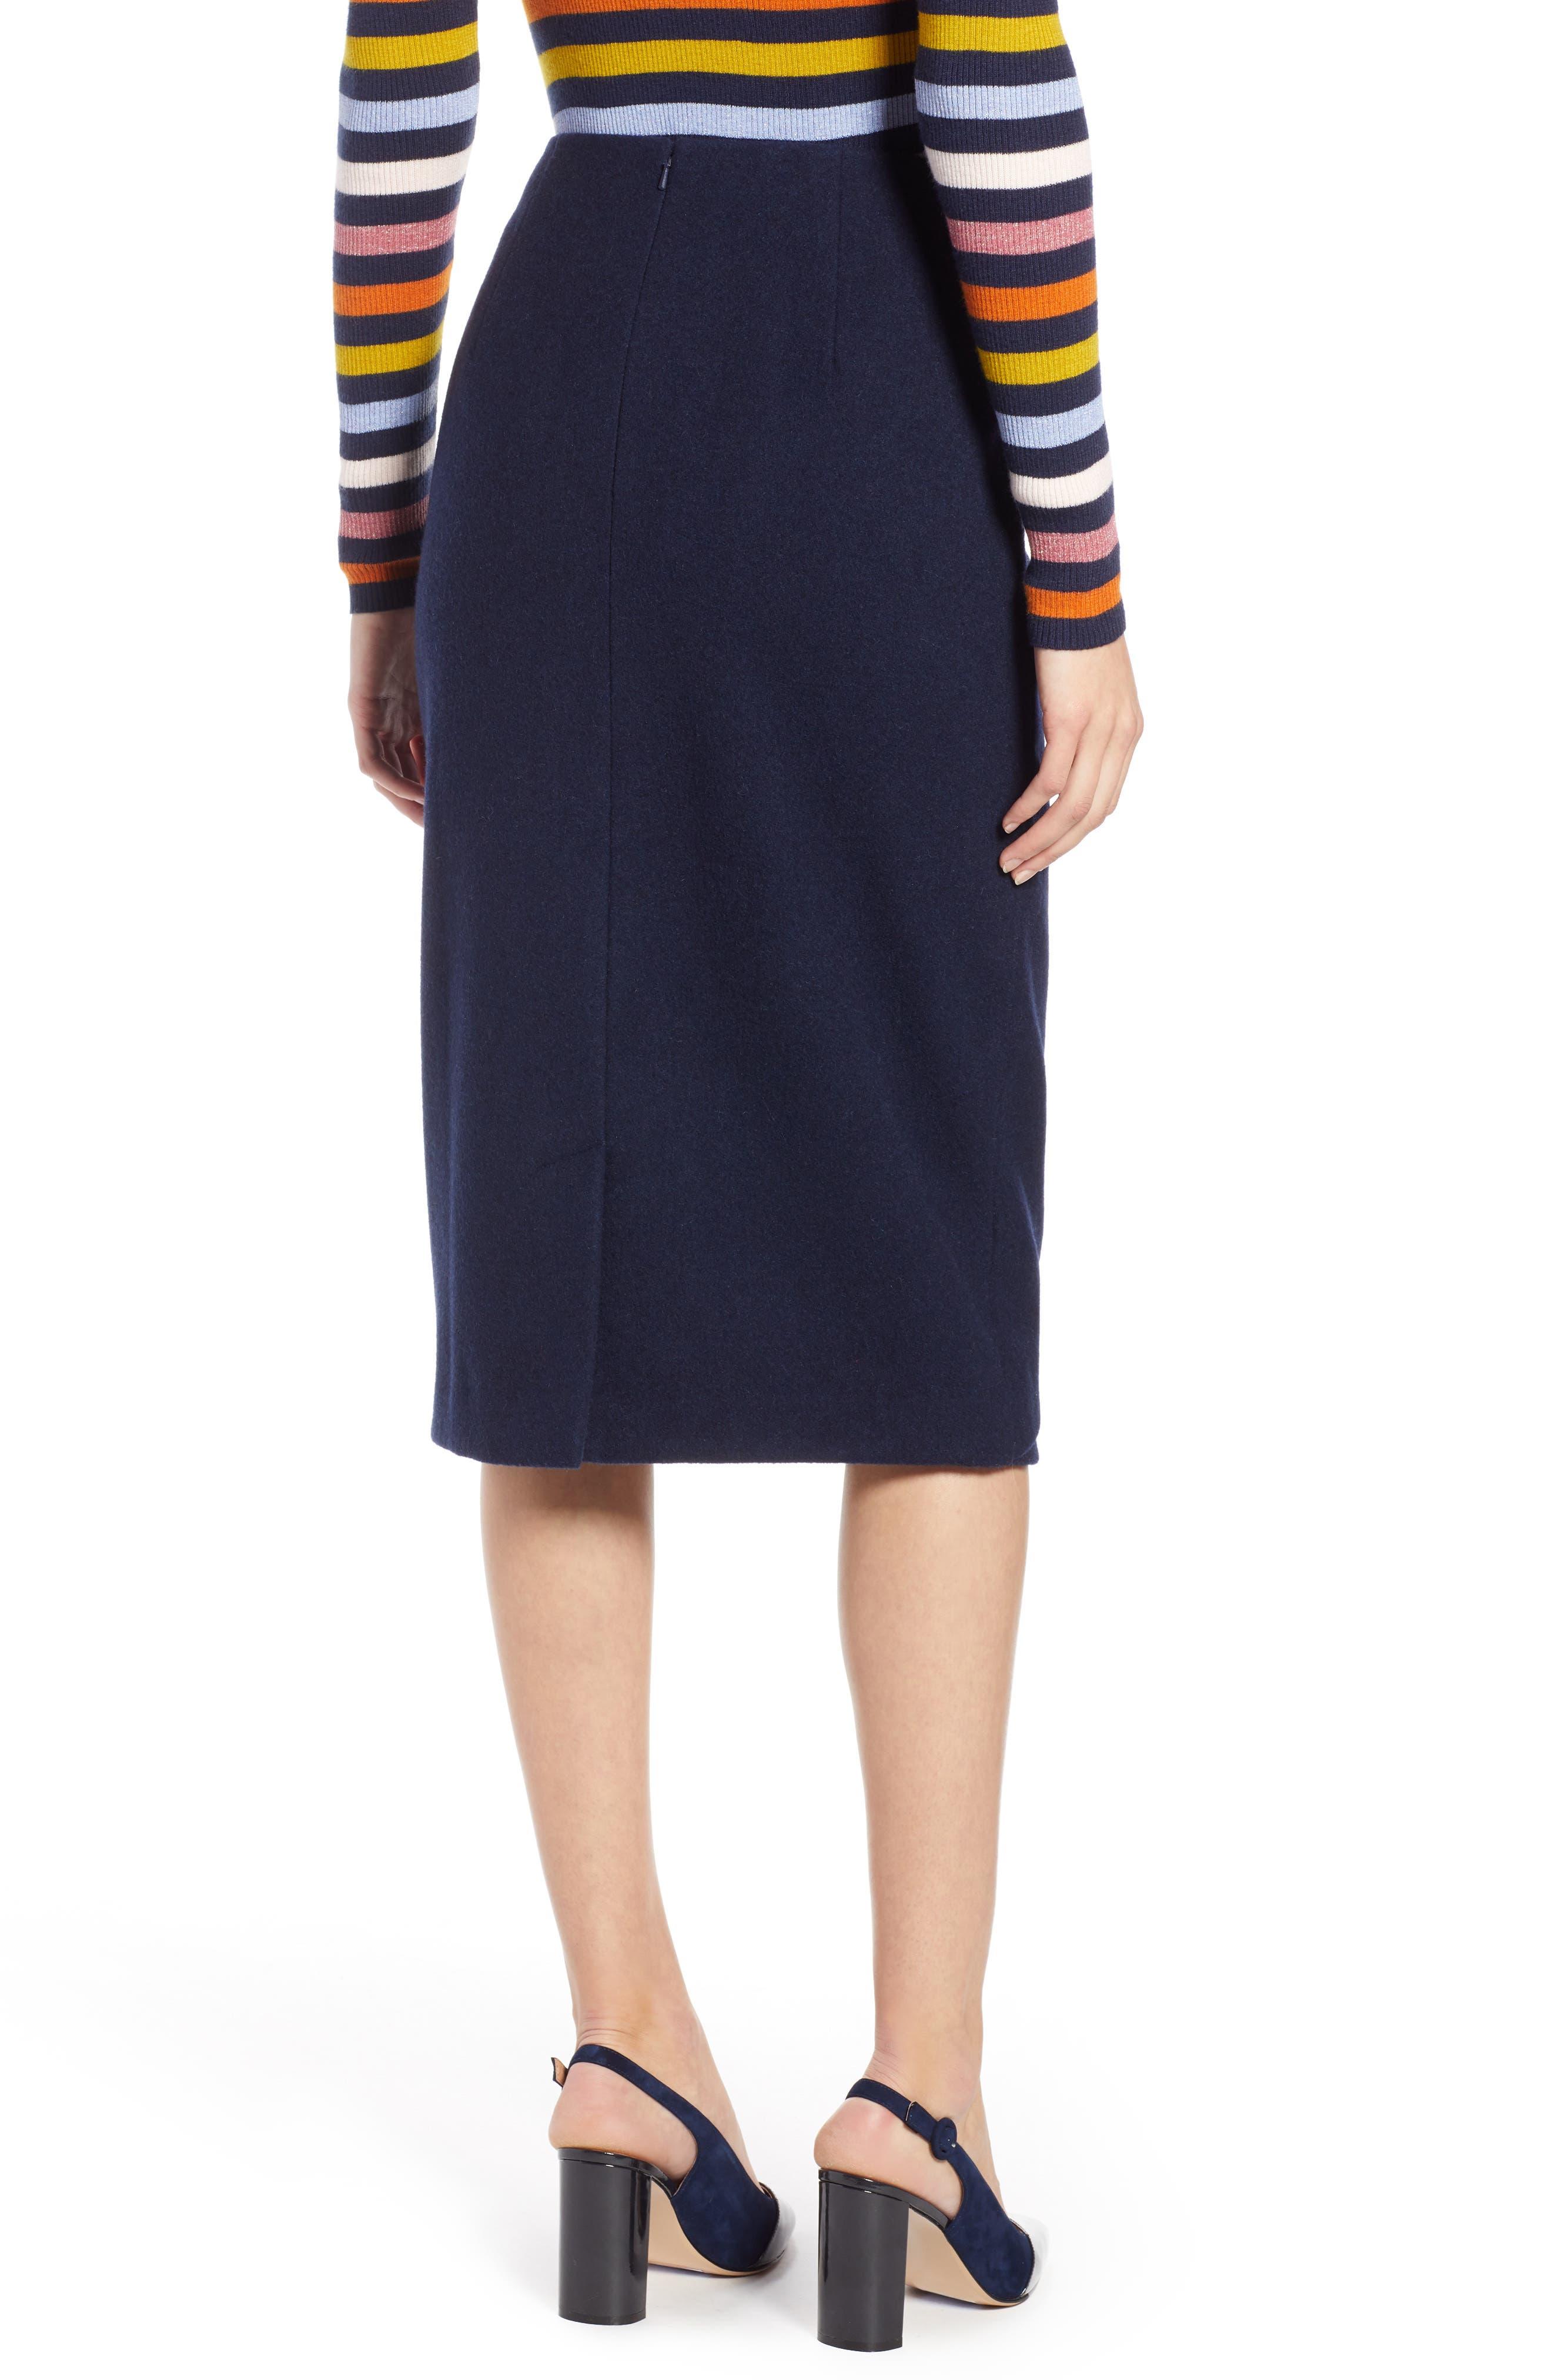 x Atlantic-Pacific Wrap Pencil Skirt,                             Alternate thumbnail 2, color,                             NAVY BLAZER